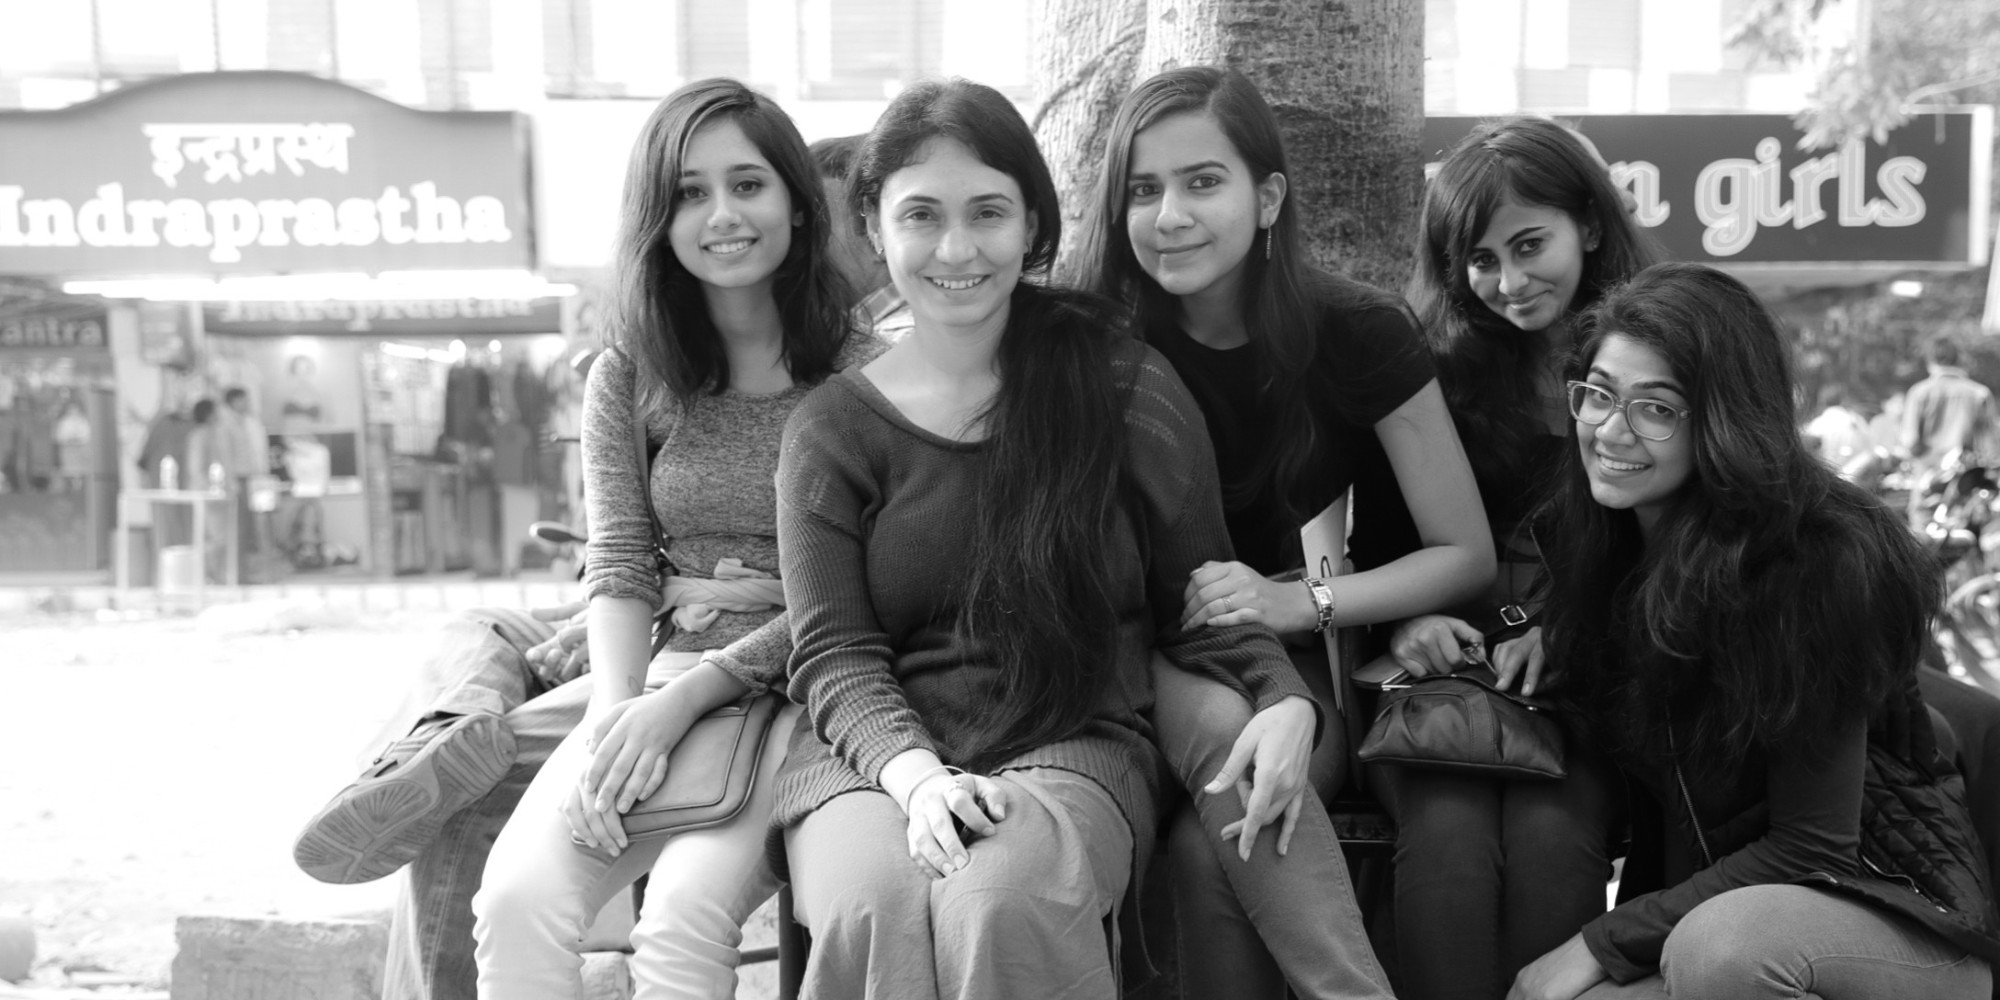 https://www.huffingtonpost.com/elsa-marie-dasilva/enabling-safe-urban-space-for-women-in-india_b_7797034.html